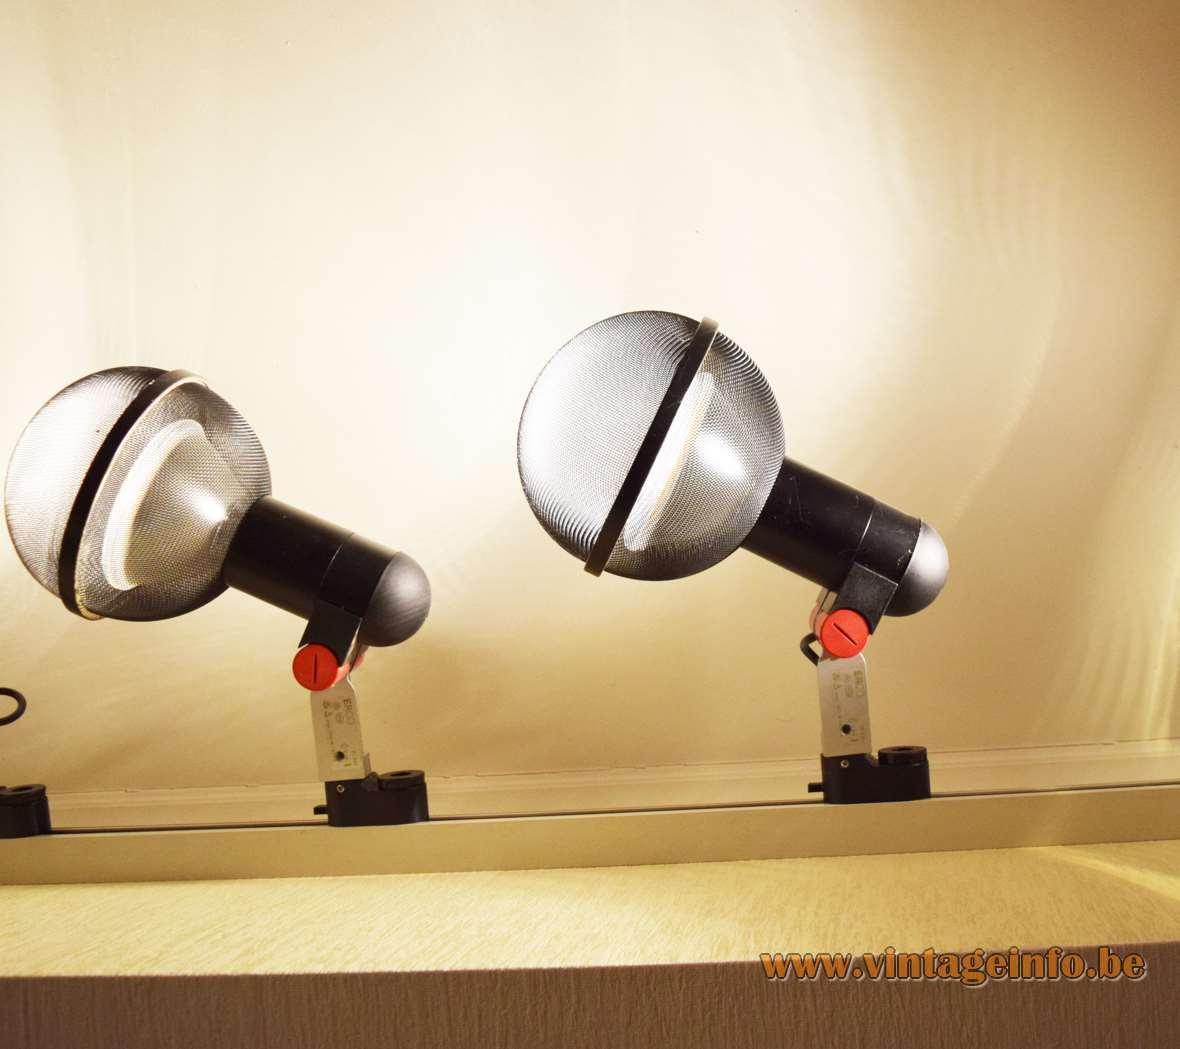 Roger Tallon ERCO Spots Micro, 1977, black, red, plastic, aluminium, industrial design, PAR38, floor